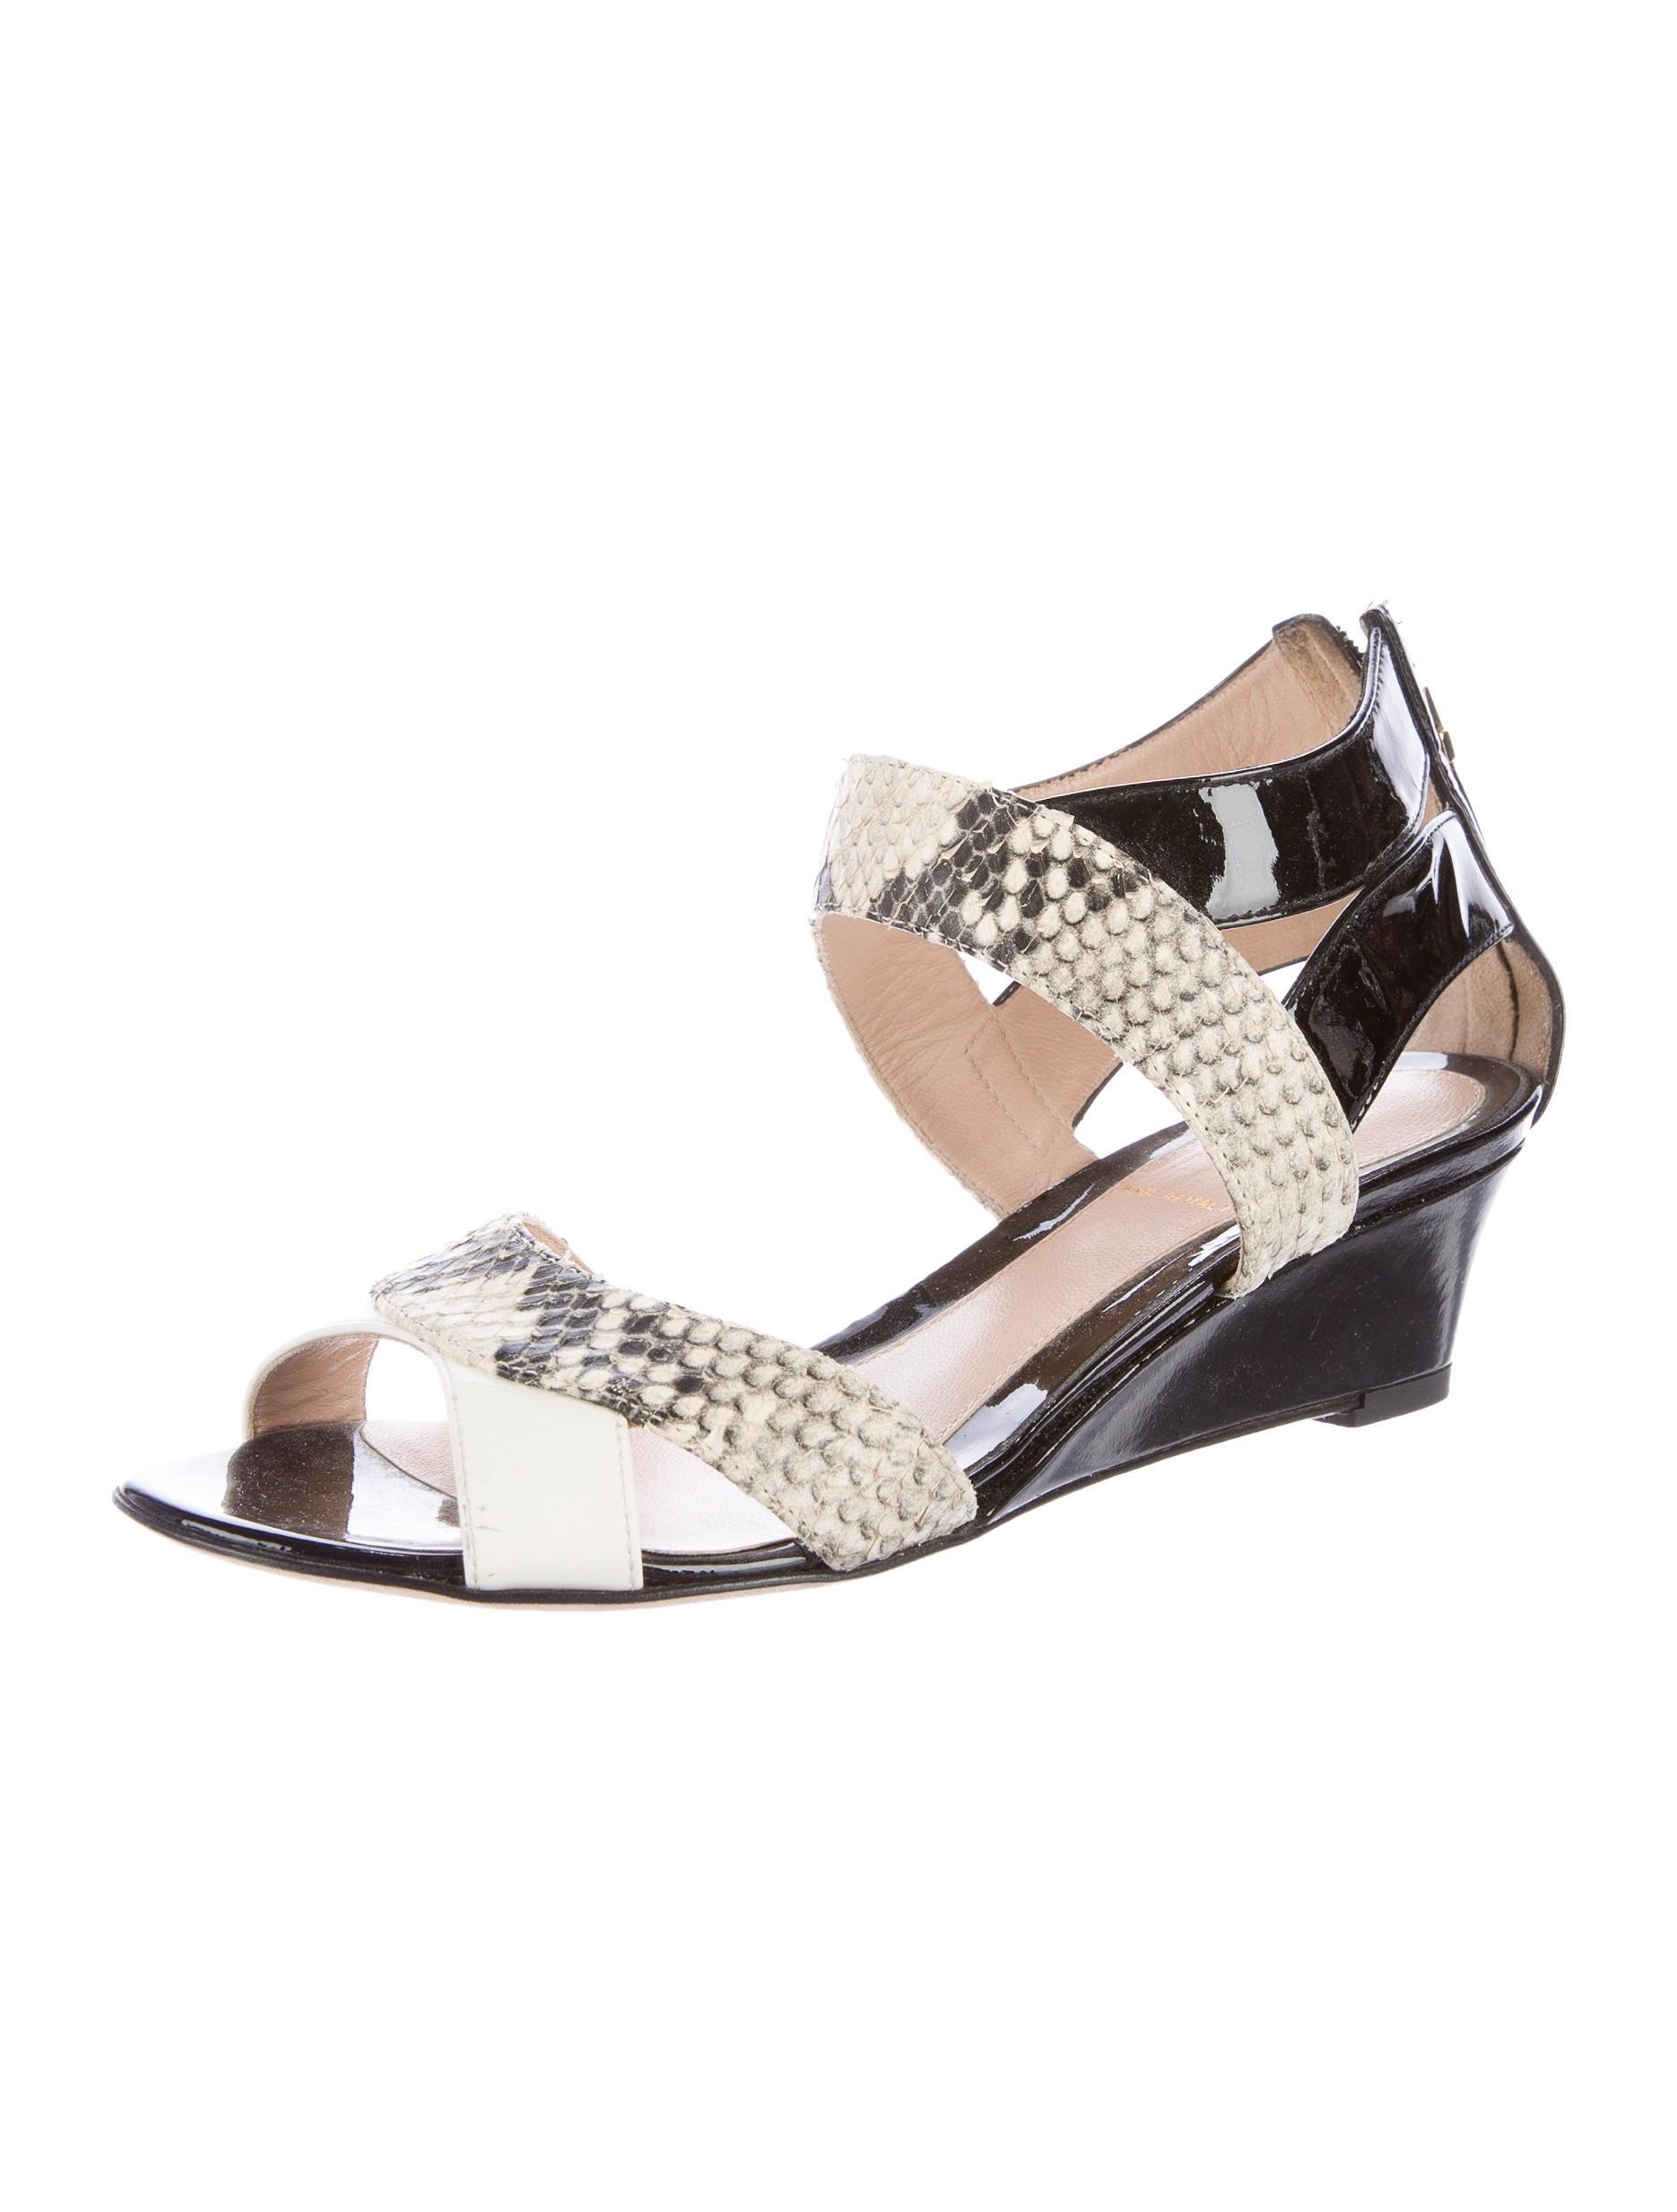 fendi snakeskin wedge sandals shoes fen52137 the